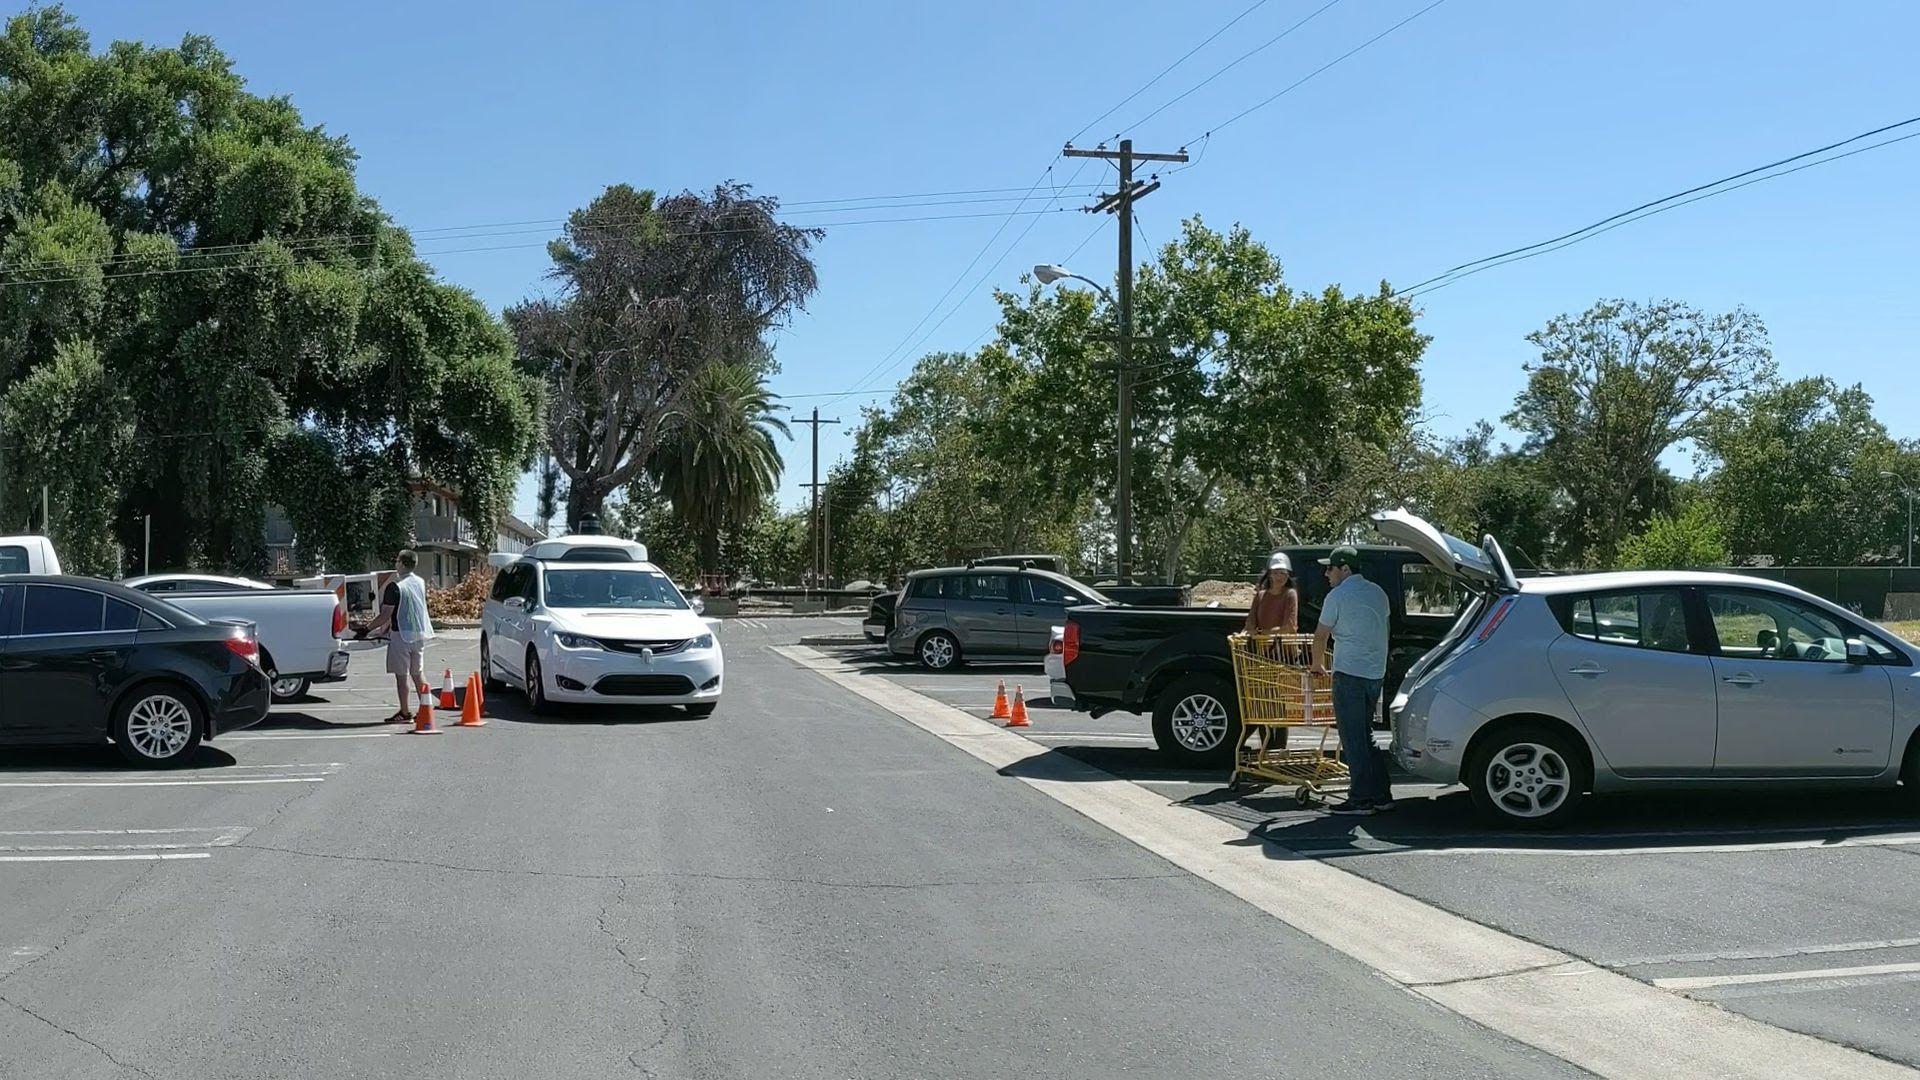 Waymo van learns how to navigate parking lots. (Photo: Waymo)